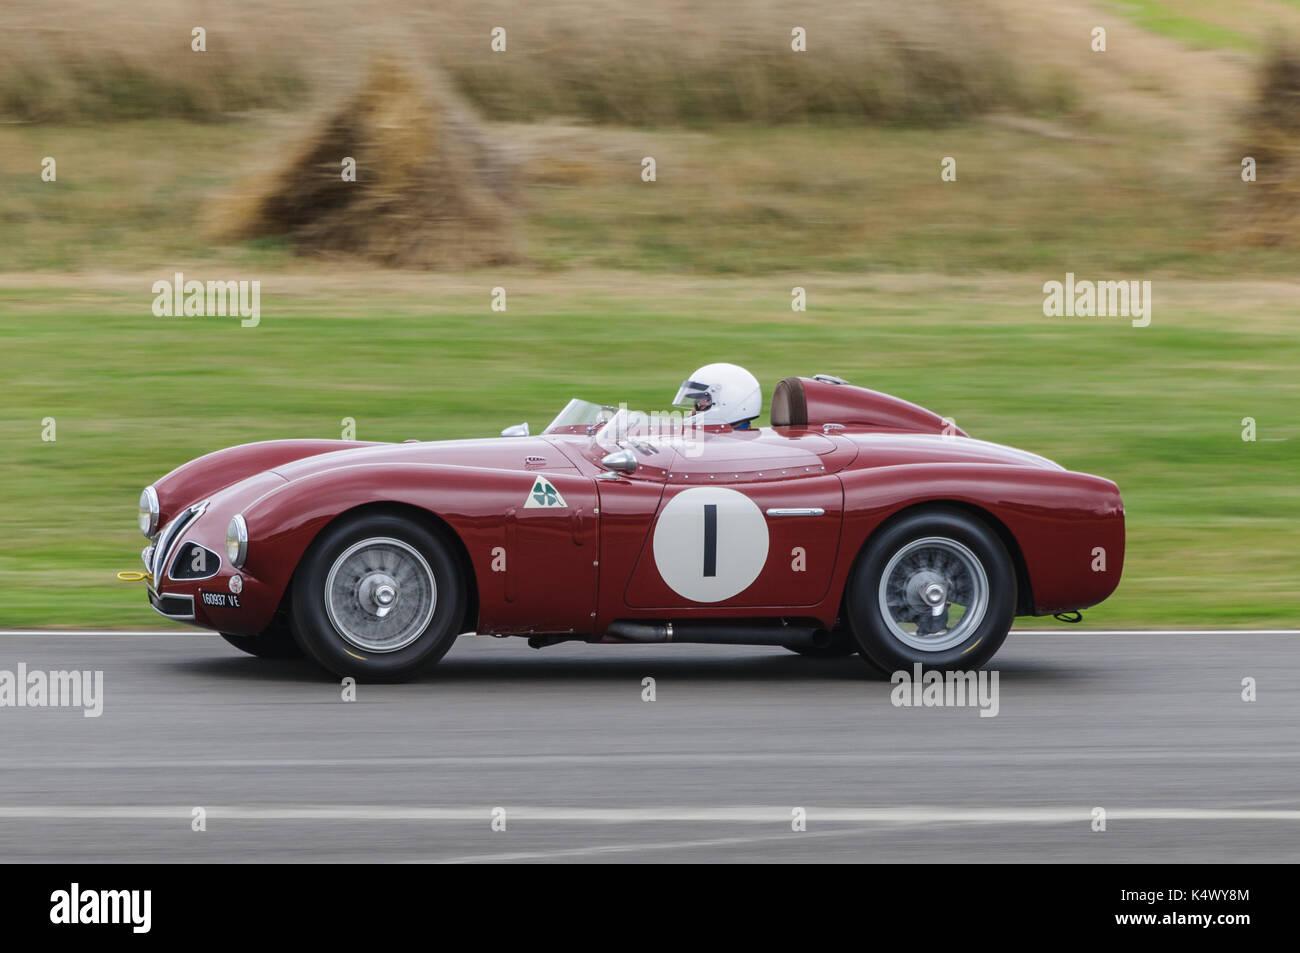 Classic Alfa Romeo at Goodwood Revival - Stock Image